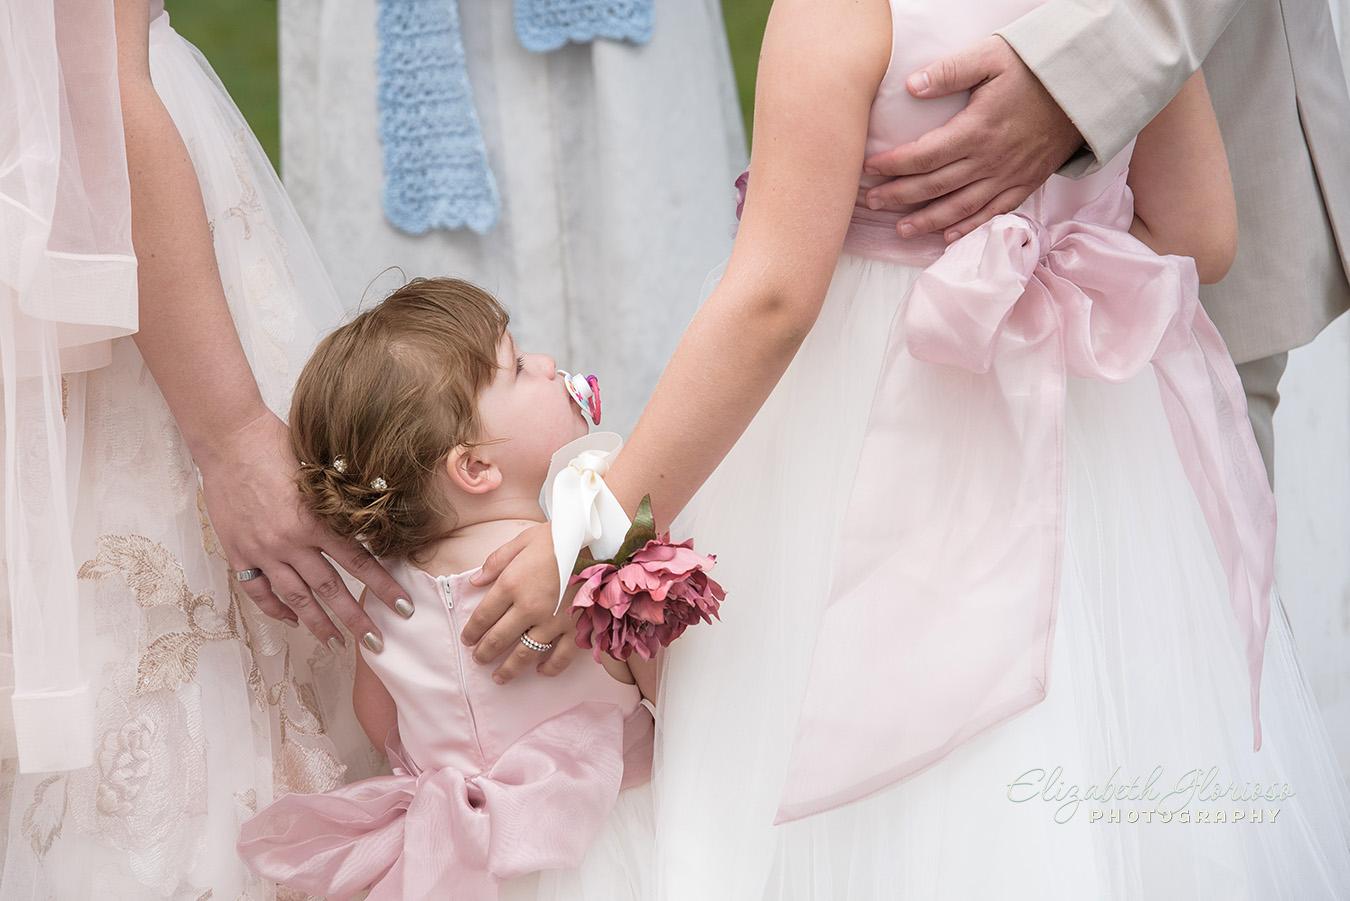 Vermilion_wedding_Glorioso Photography_1030